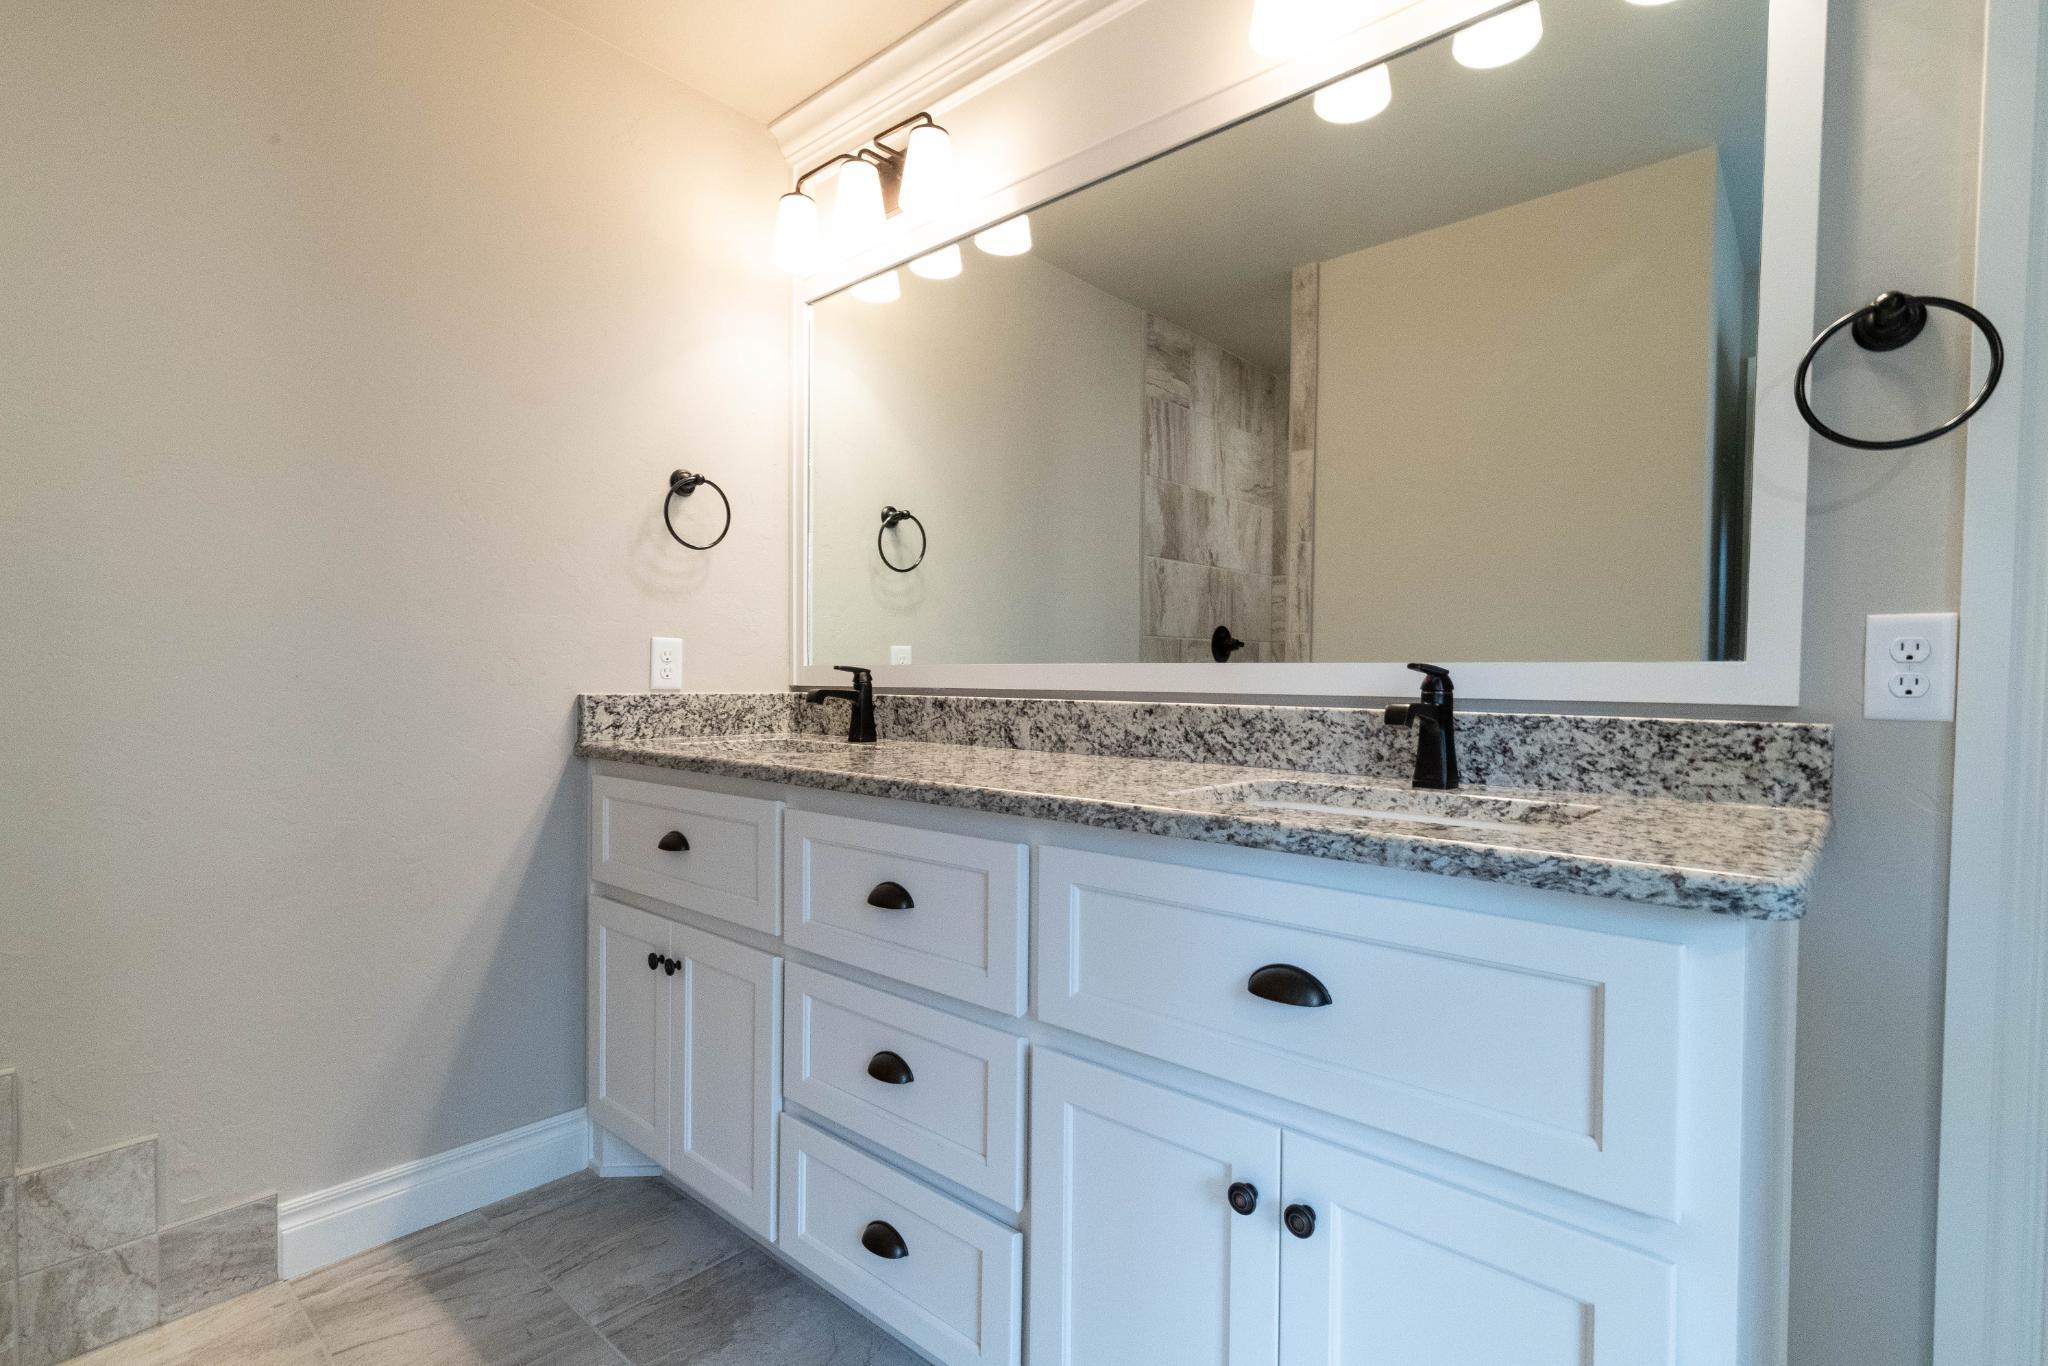 Bathroom featured in the Hazel Bonus Room - 5 Bedroom By Homes By Taber in Oklahoma City, OK